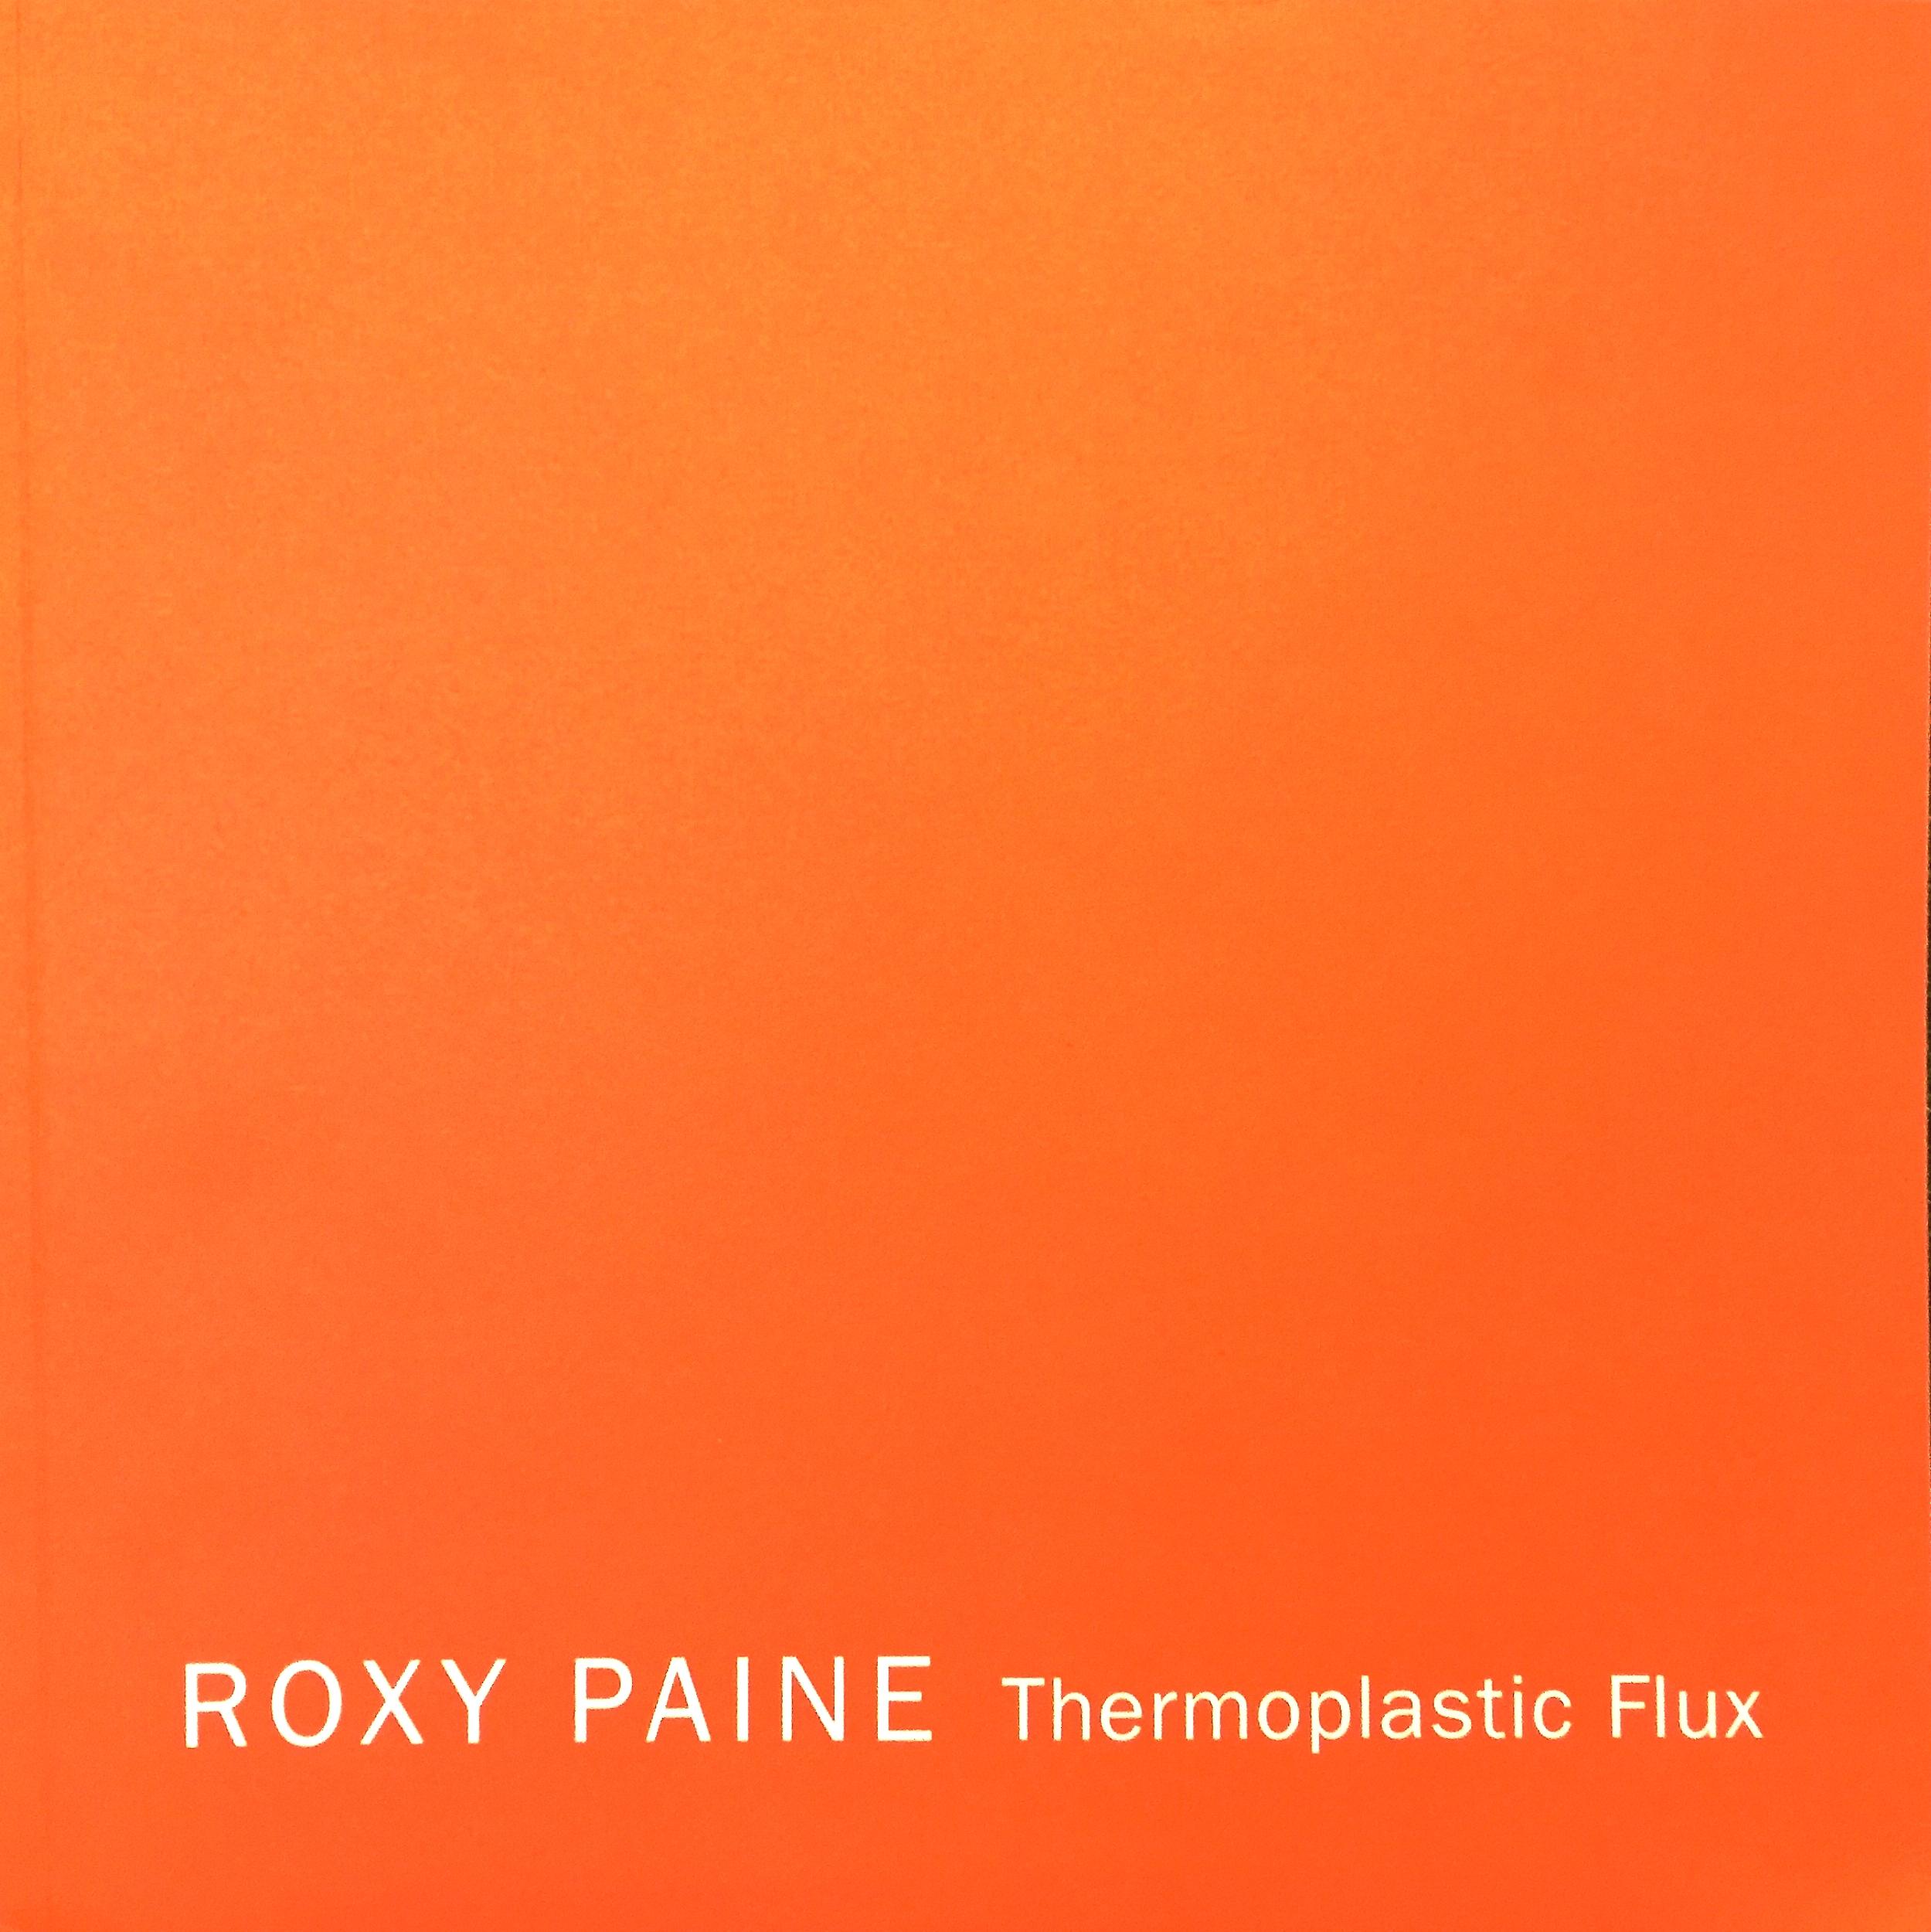 Roxy Paine: Thermoplastic Flux